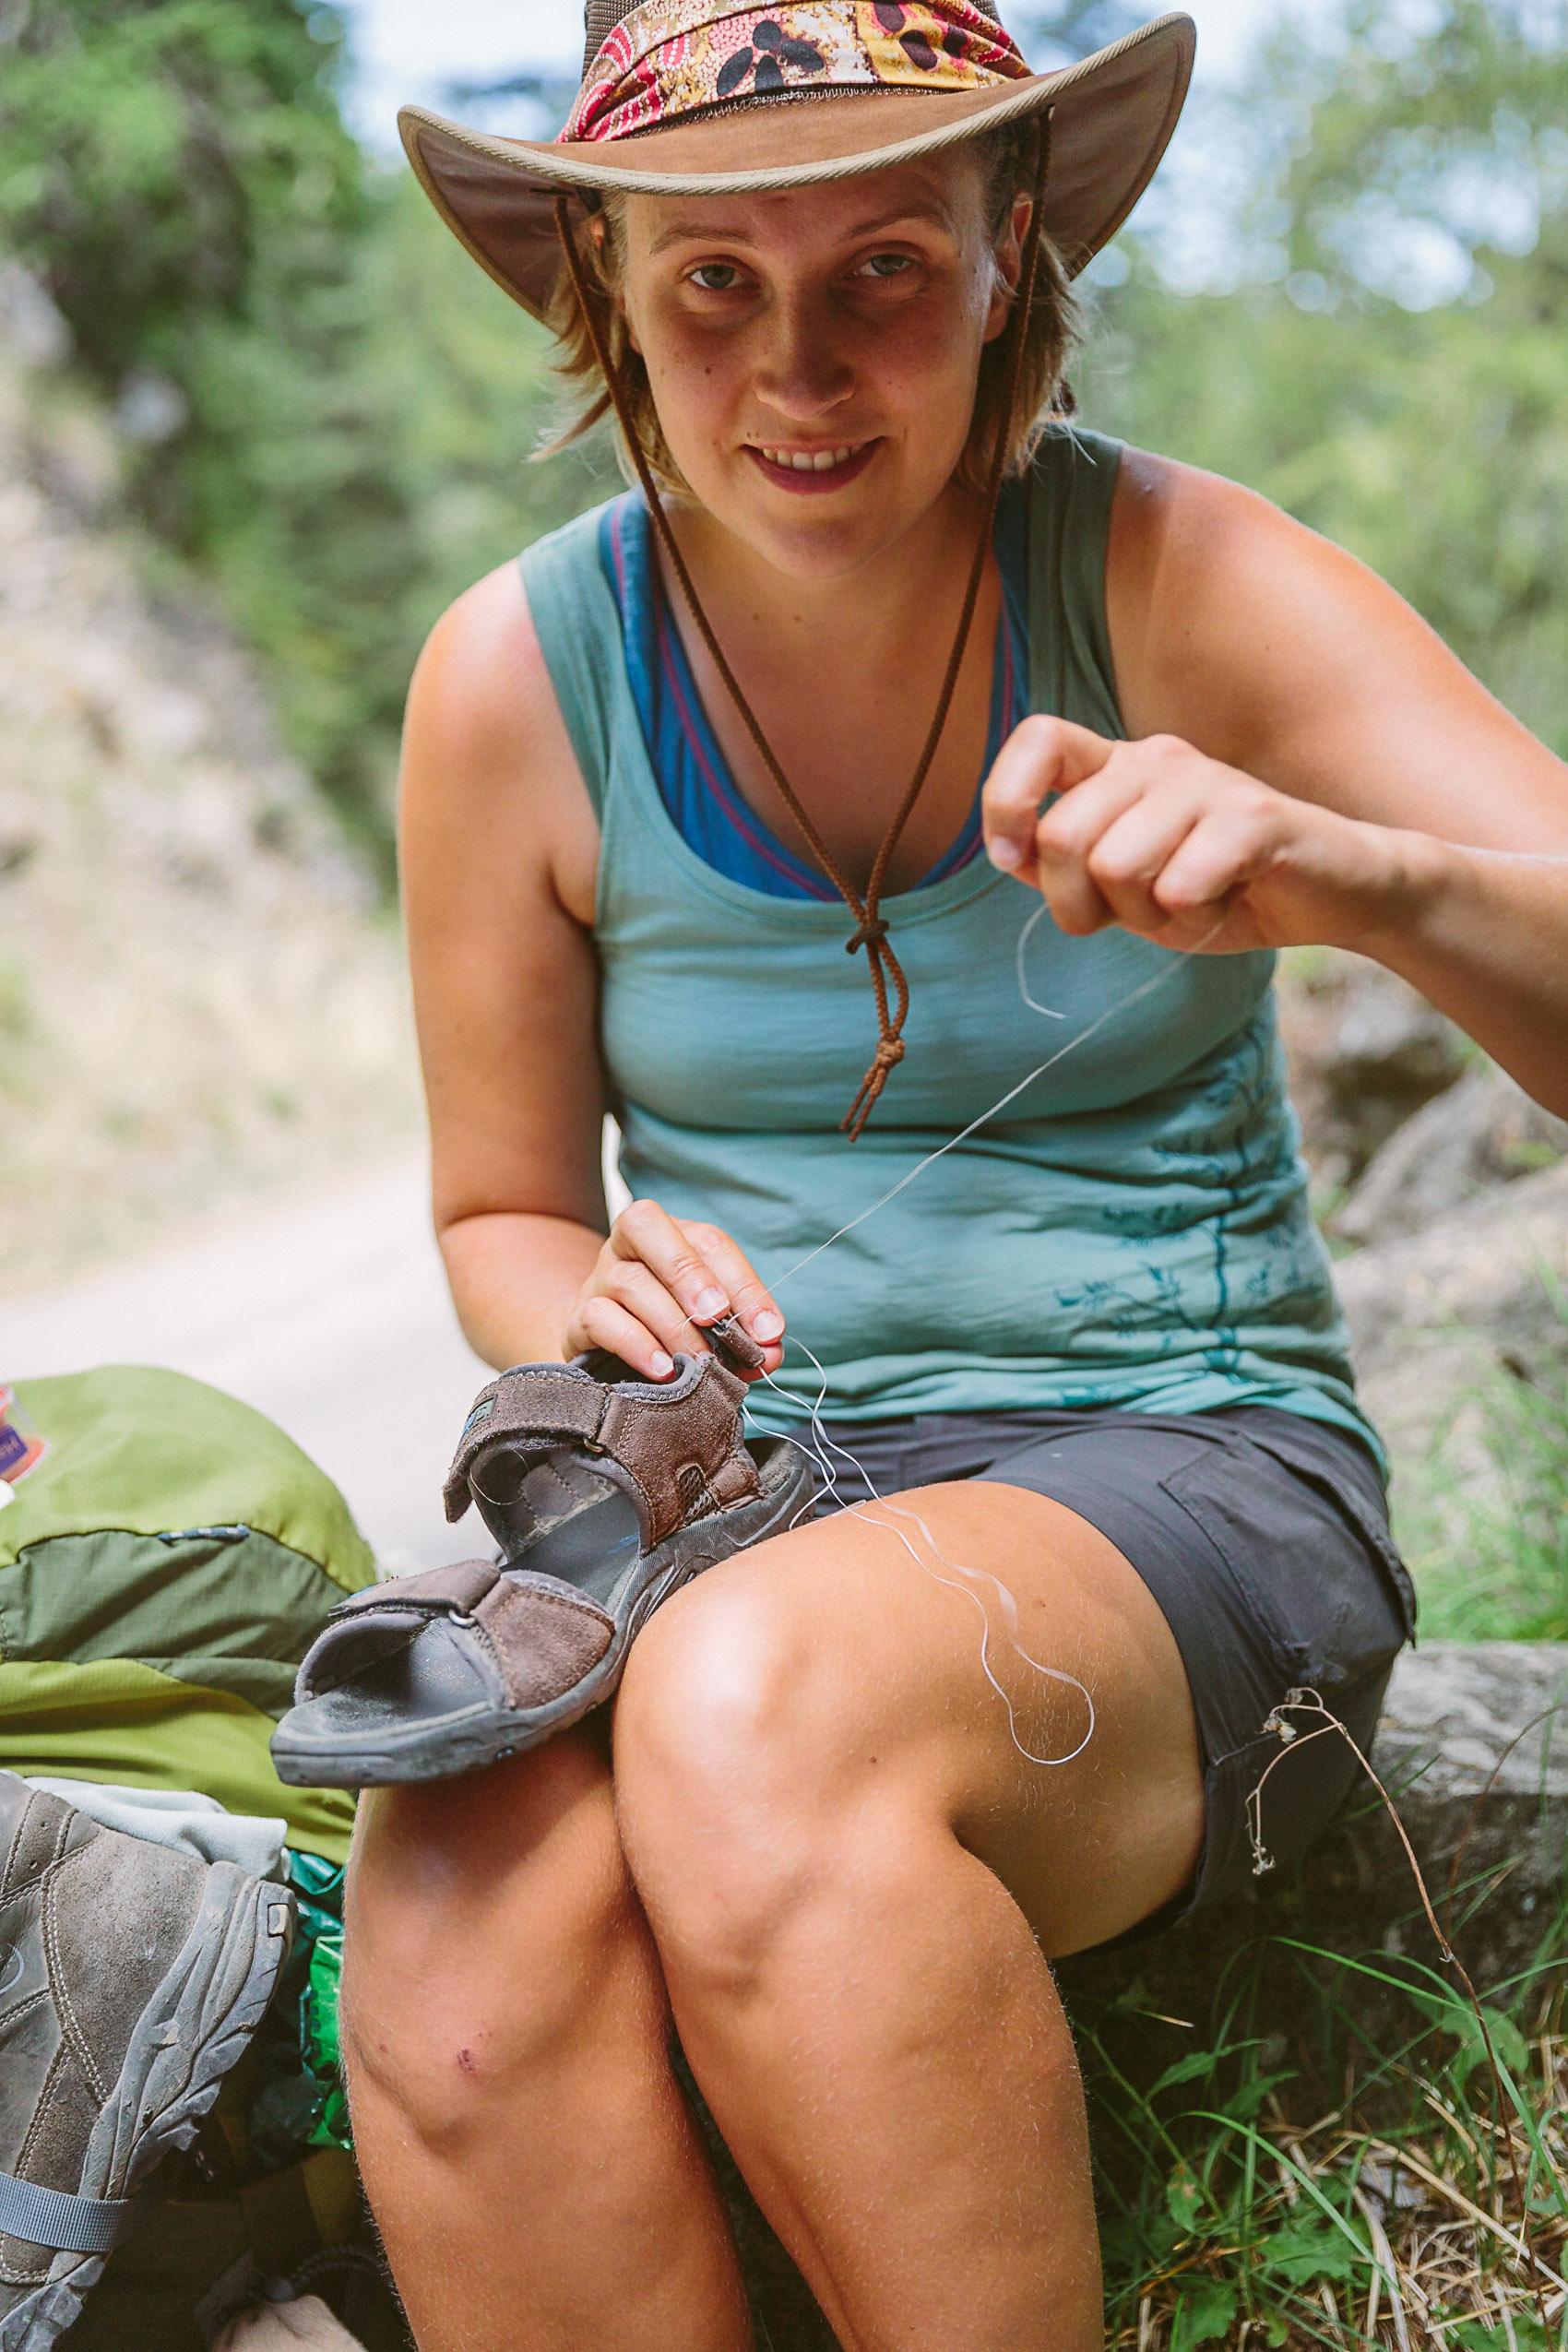 Shoe repairs with dental floss